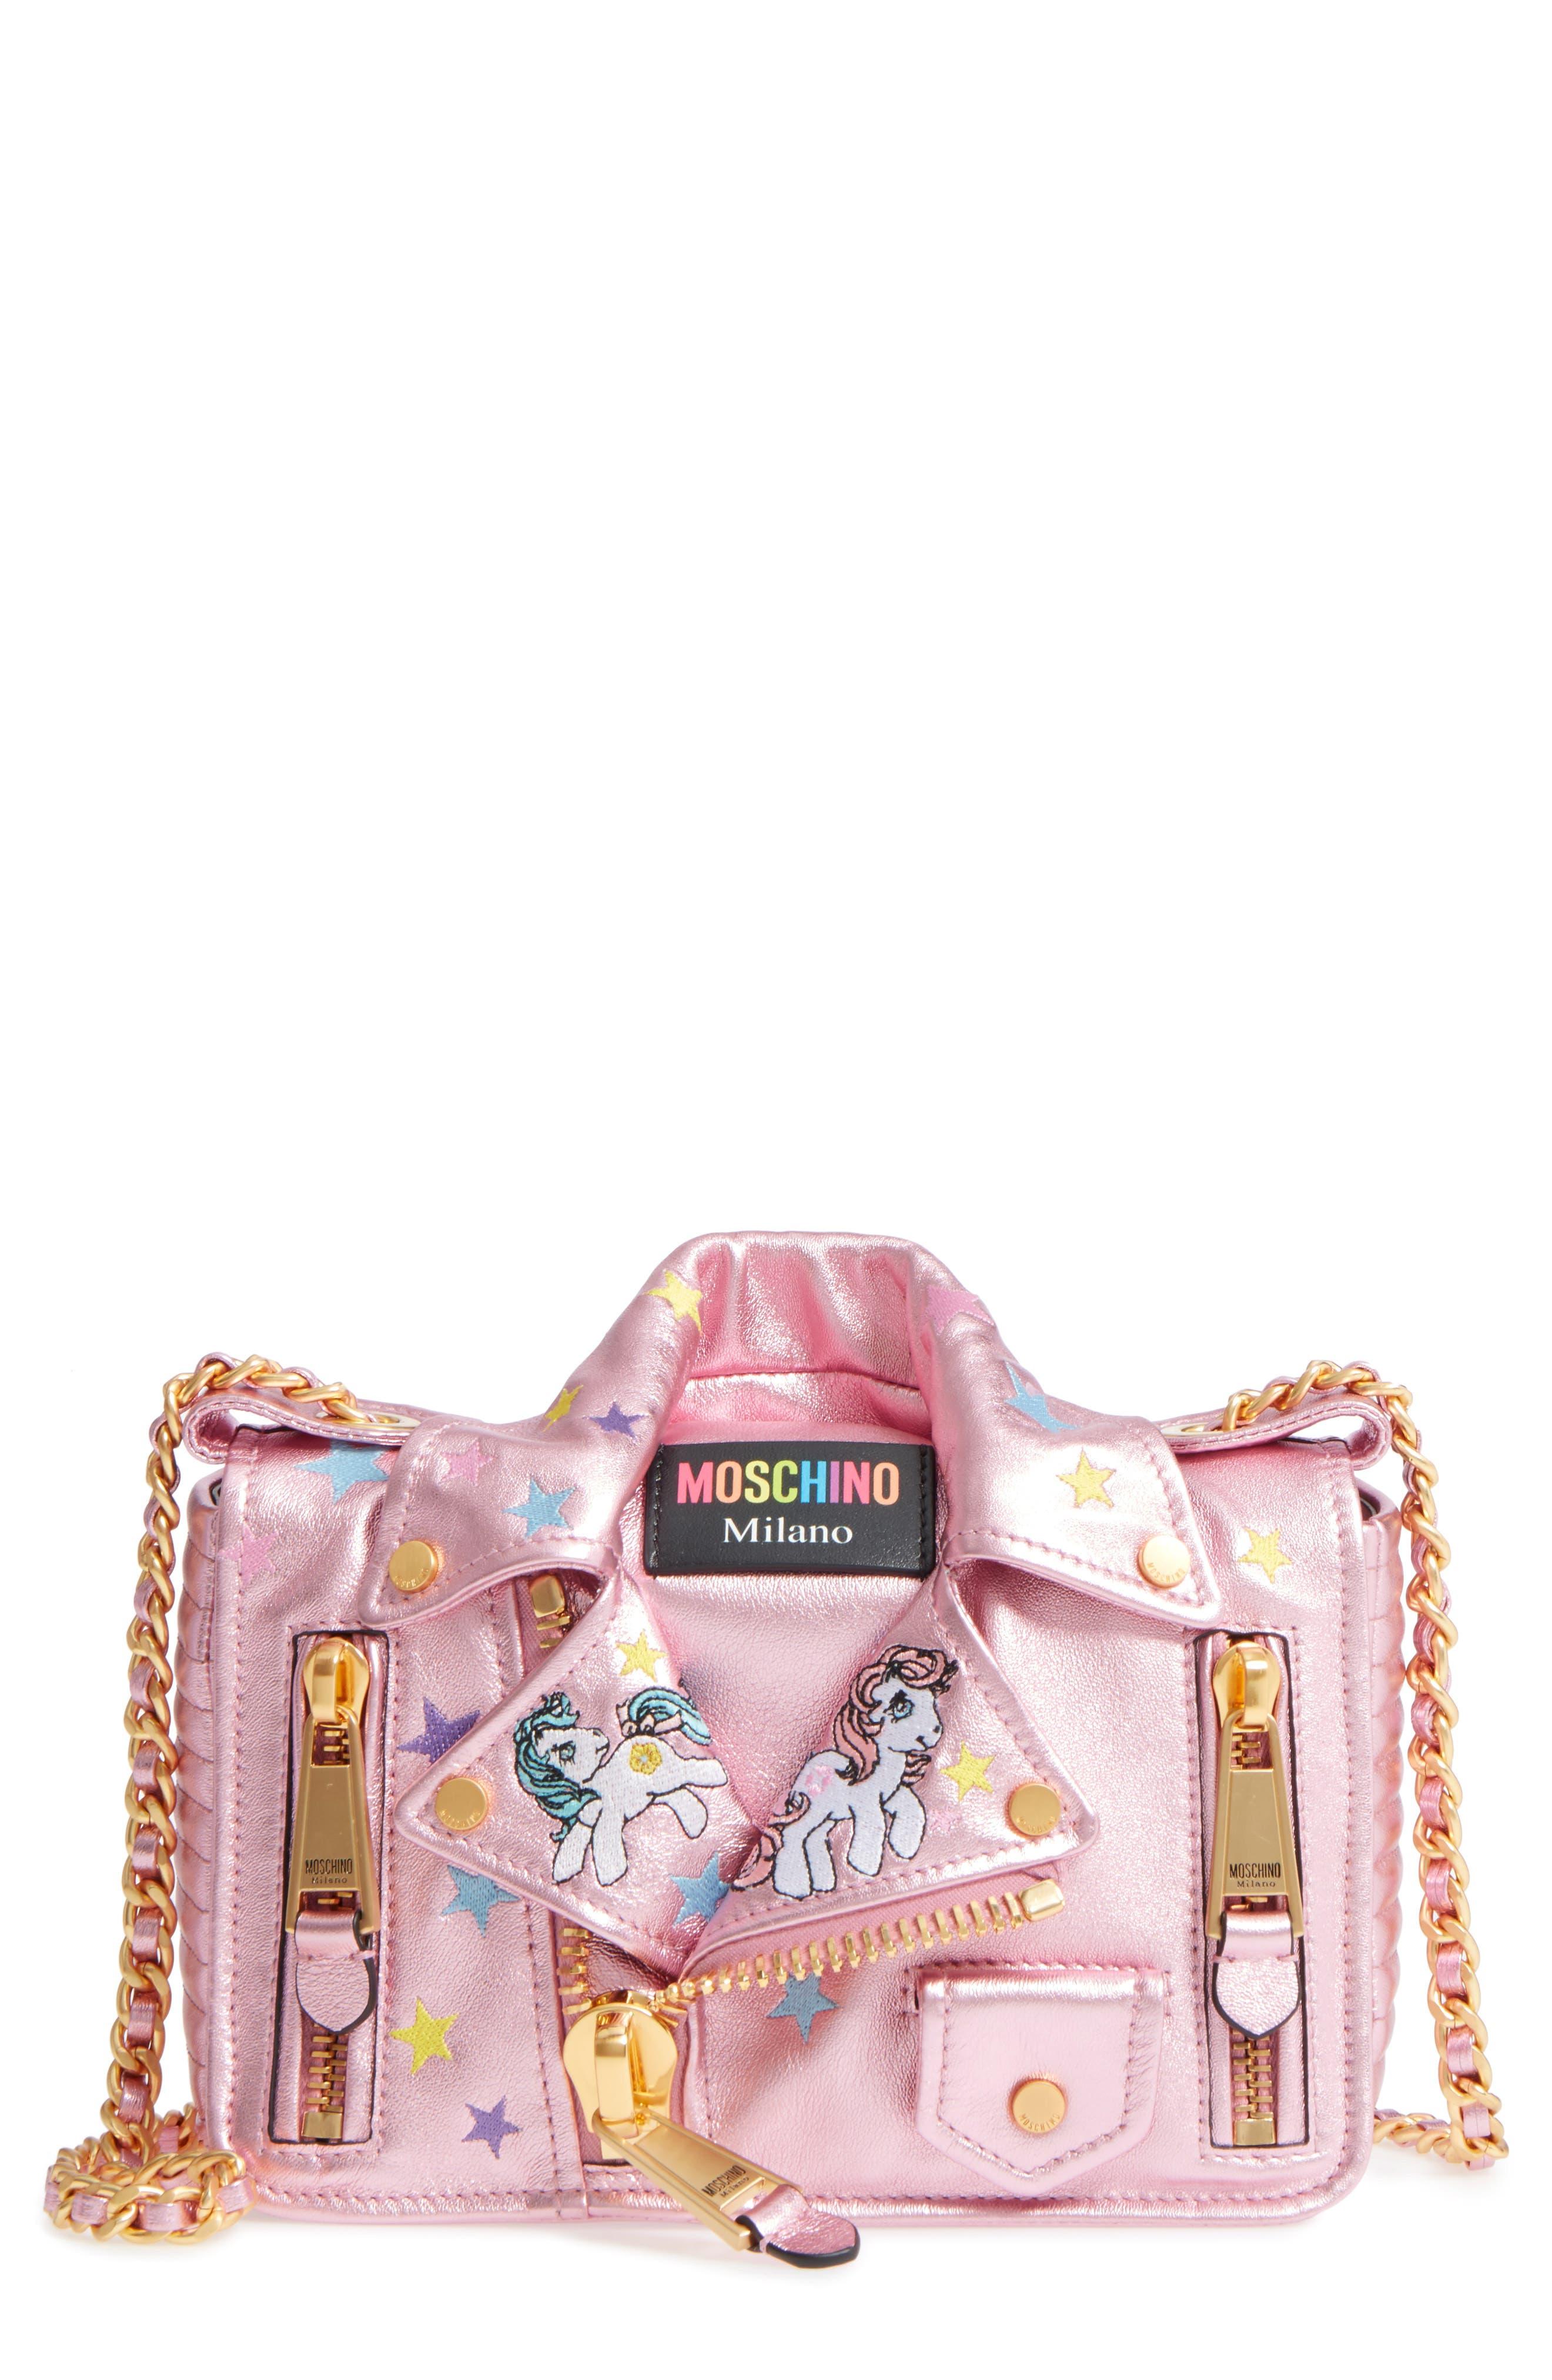 x My Little Pony Biker Jacket Metallic Leather Crossbody Bag,                         Main,                         color, 661